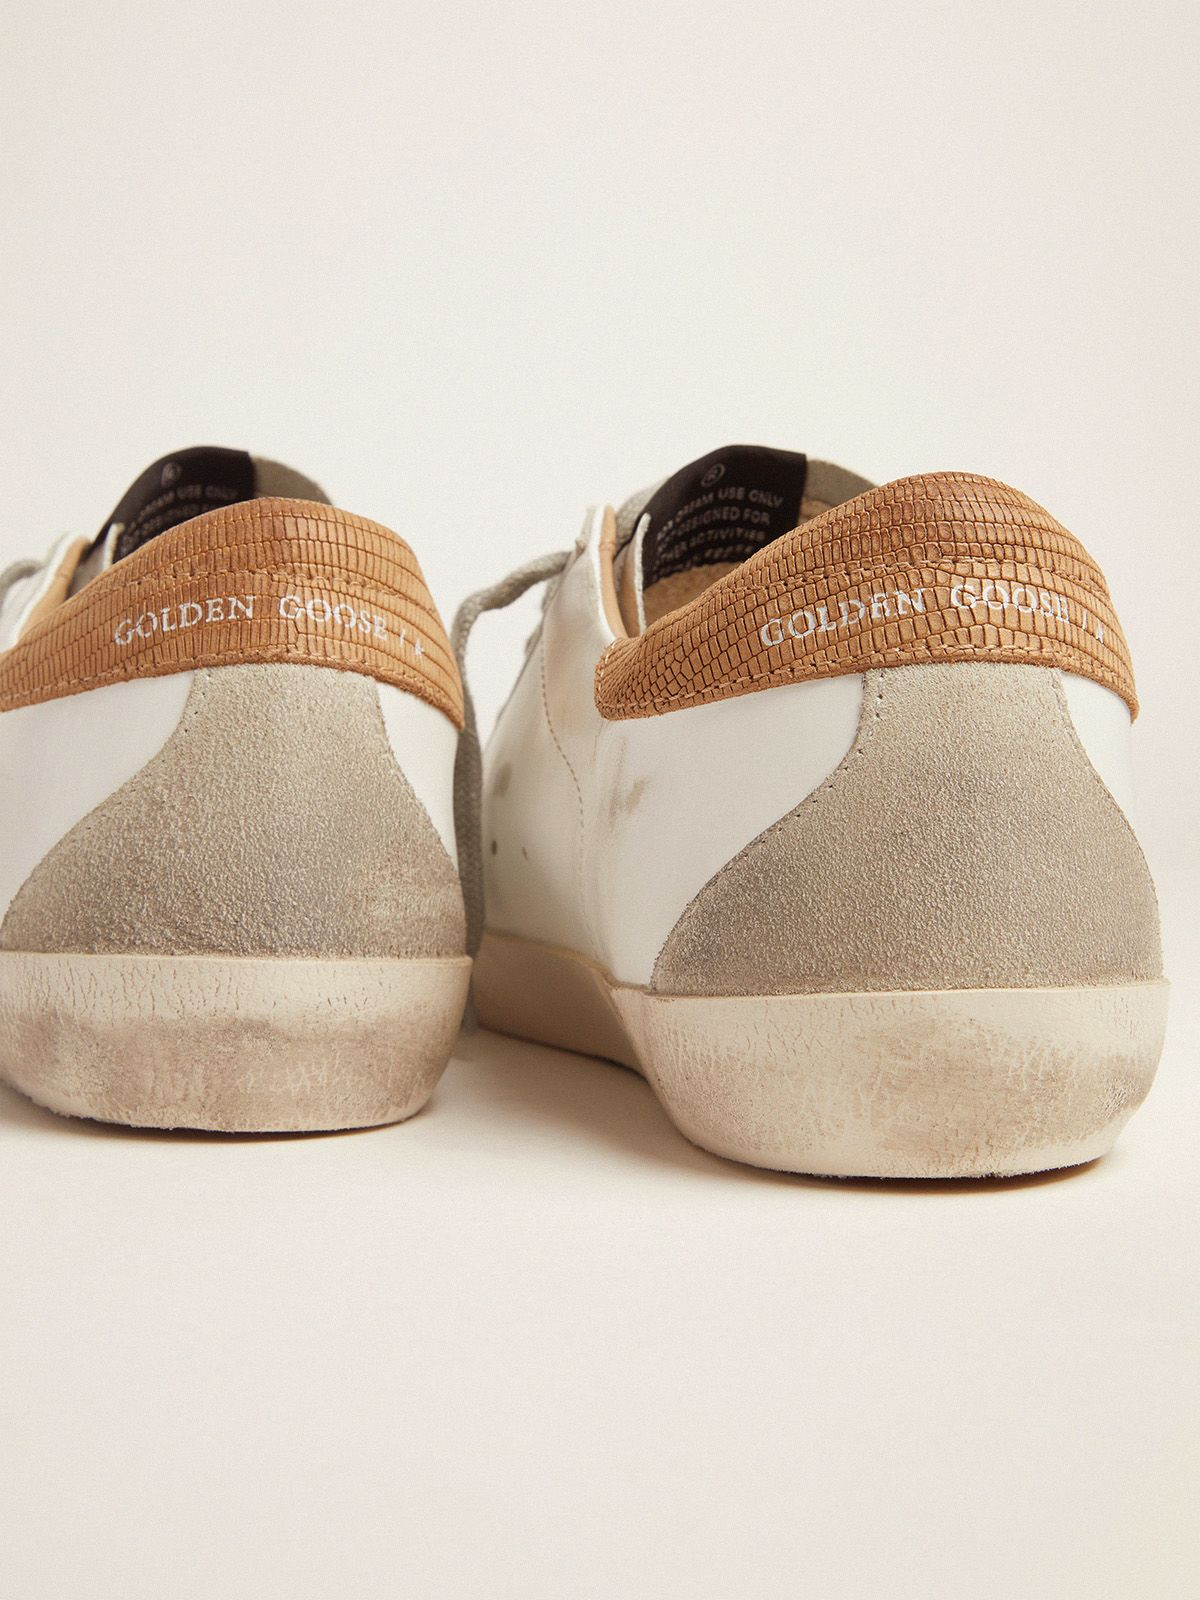 Golden Goose - Sneakers Super-Star uomo con talloncino stampa lucertolina in